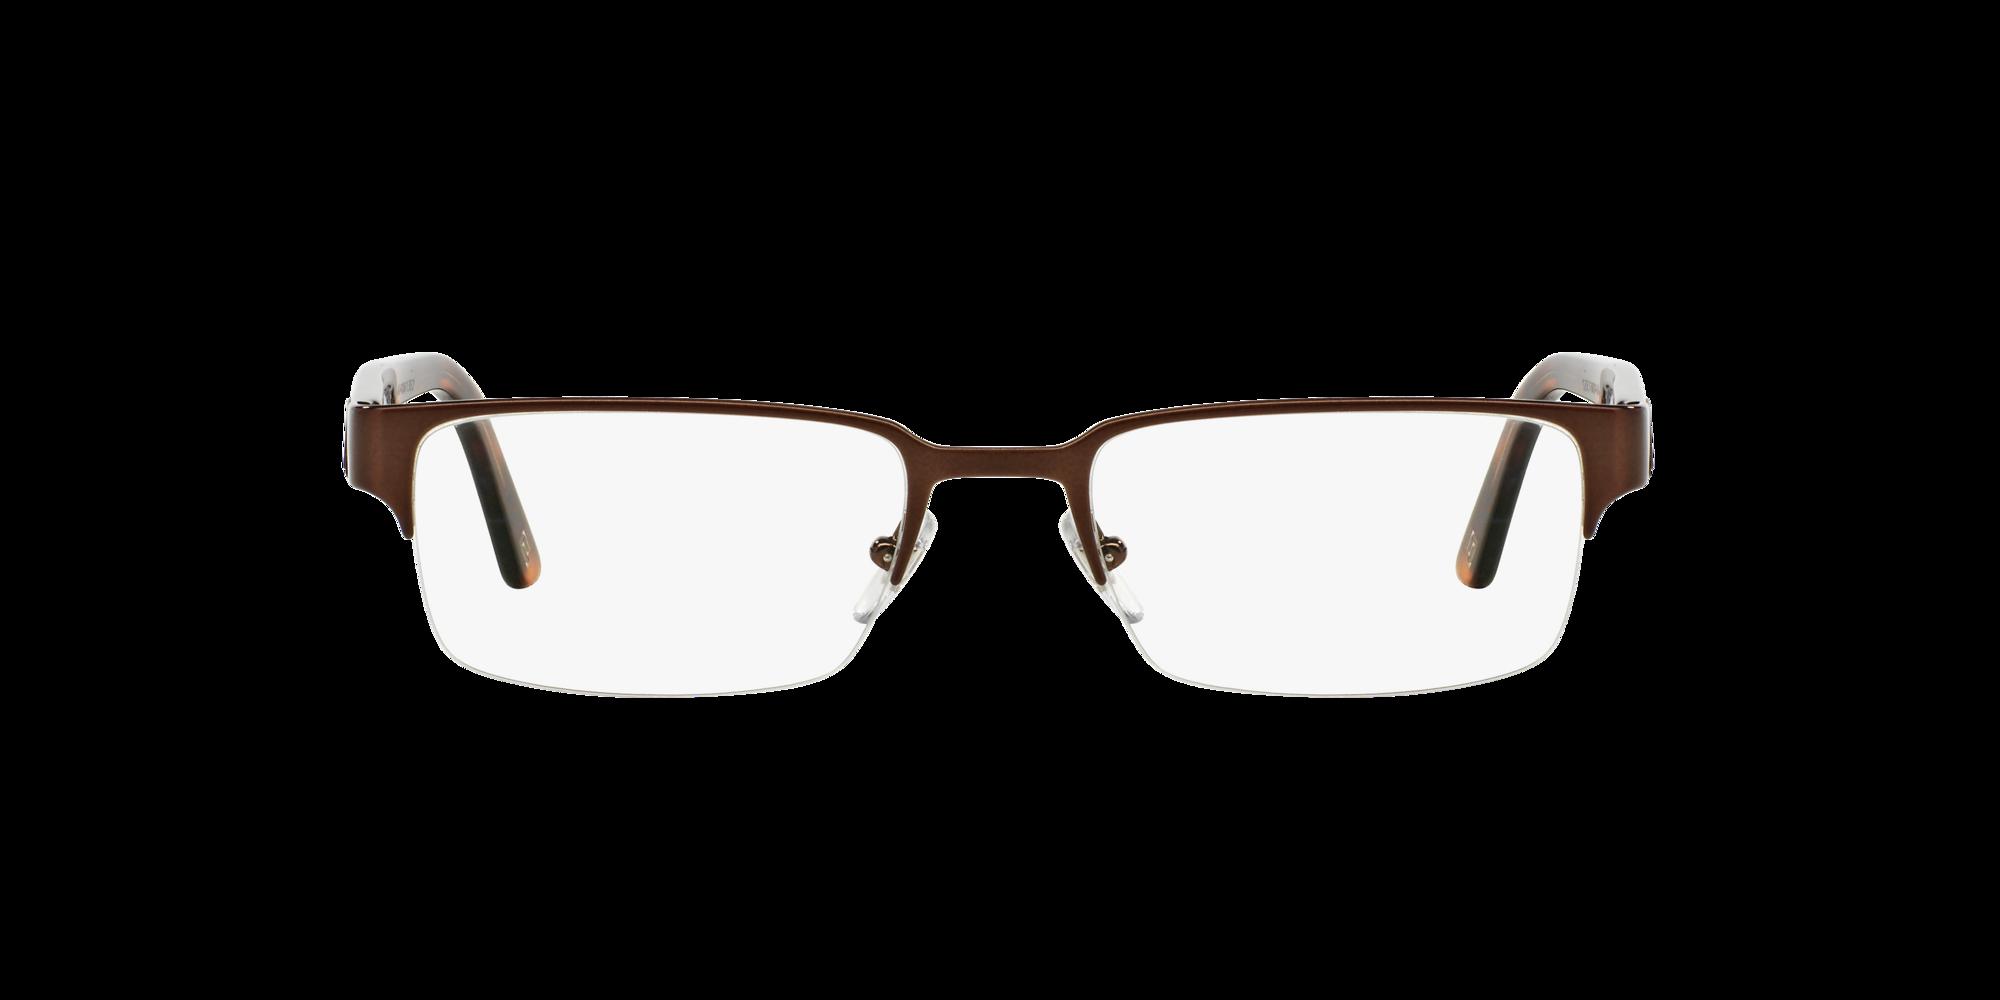 Image for VE1184 from LensCrafters | Glasses, Prescription Glasses Online, Eyewear